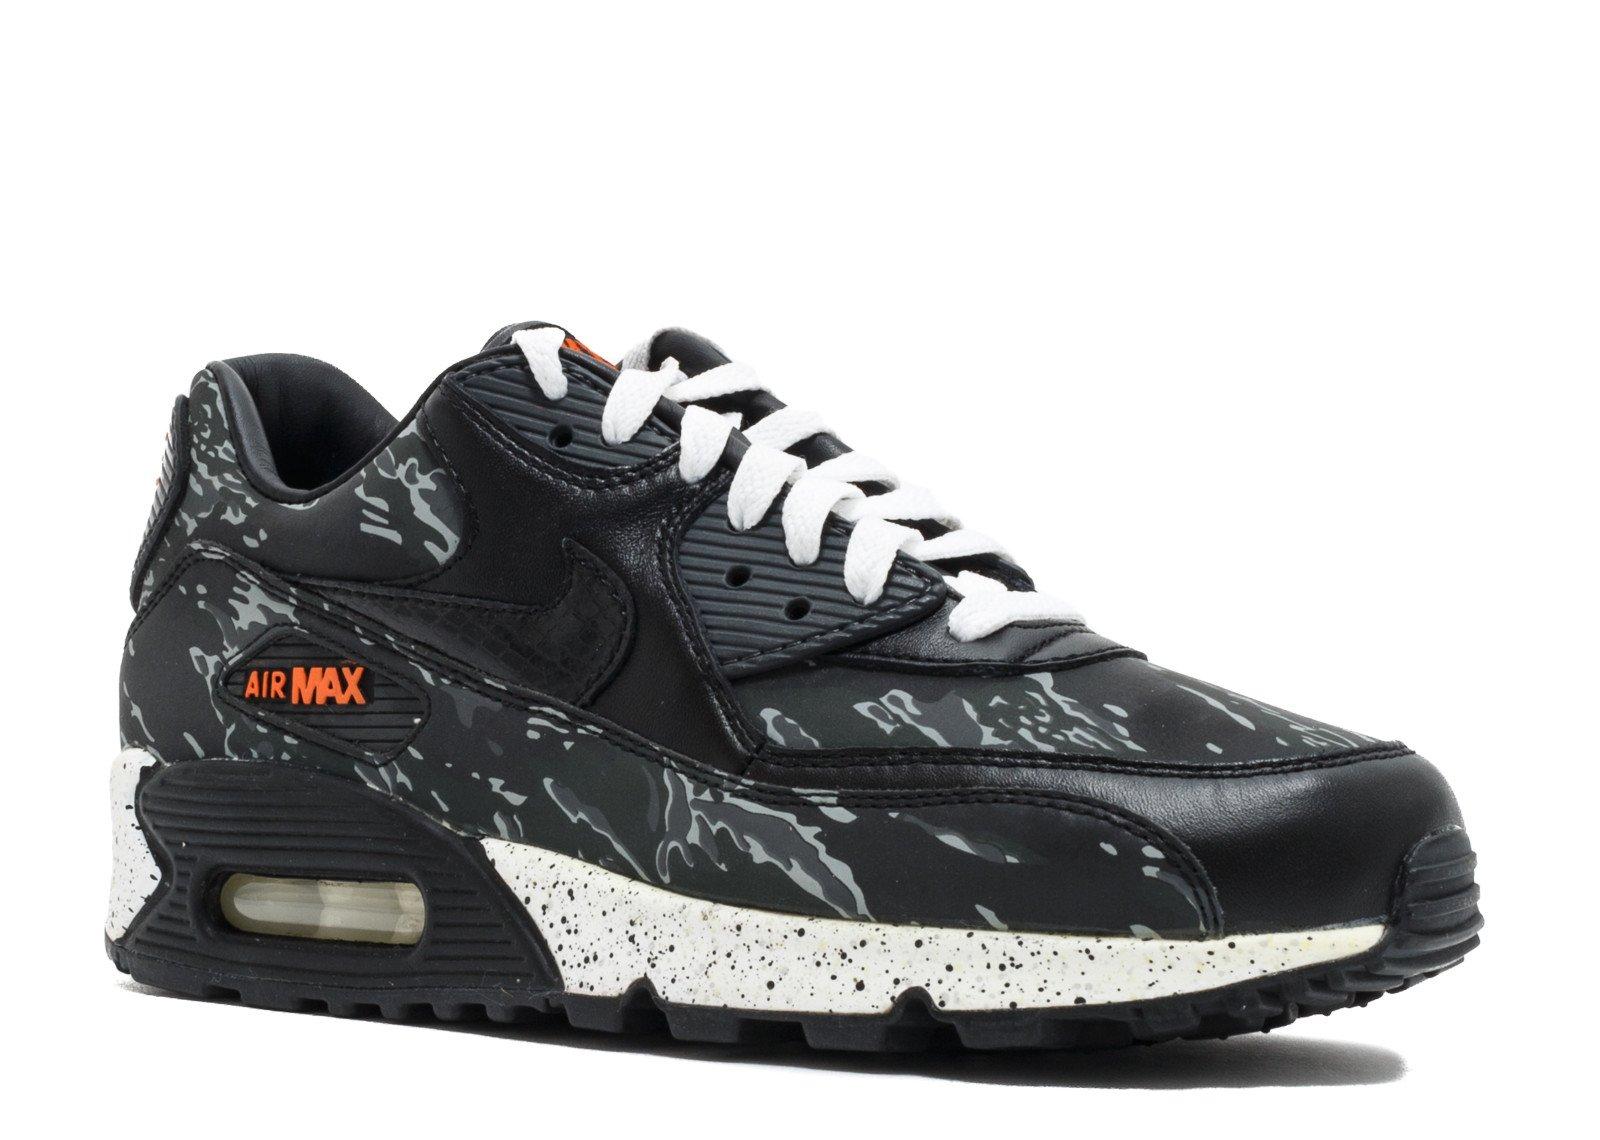 Nike Air Max 90 Premium Men´s Nike Sportswear Shoes 333888 403 Nike Store (UK) |